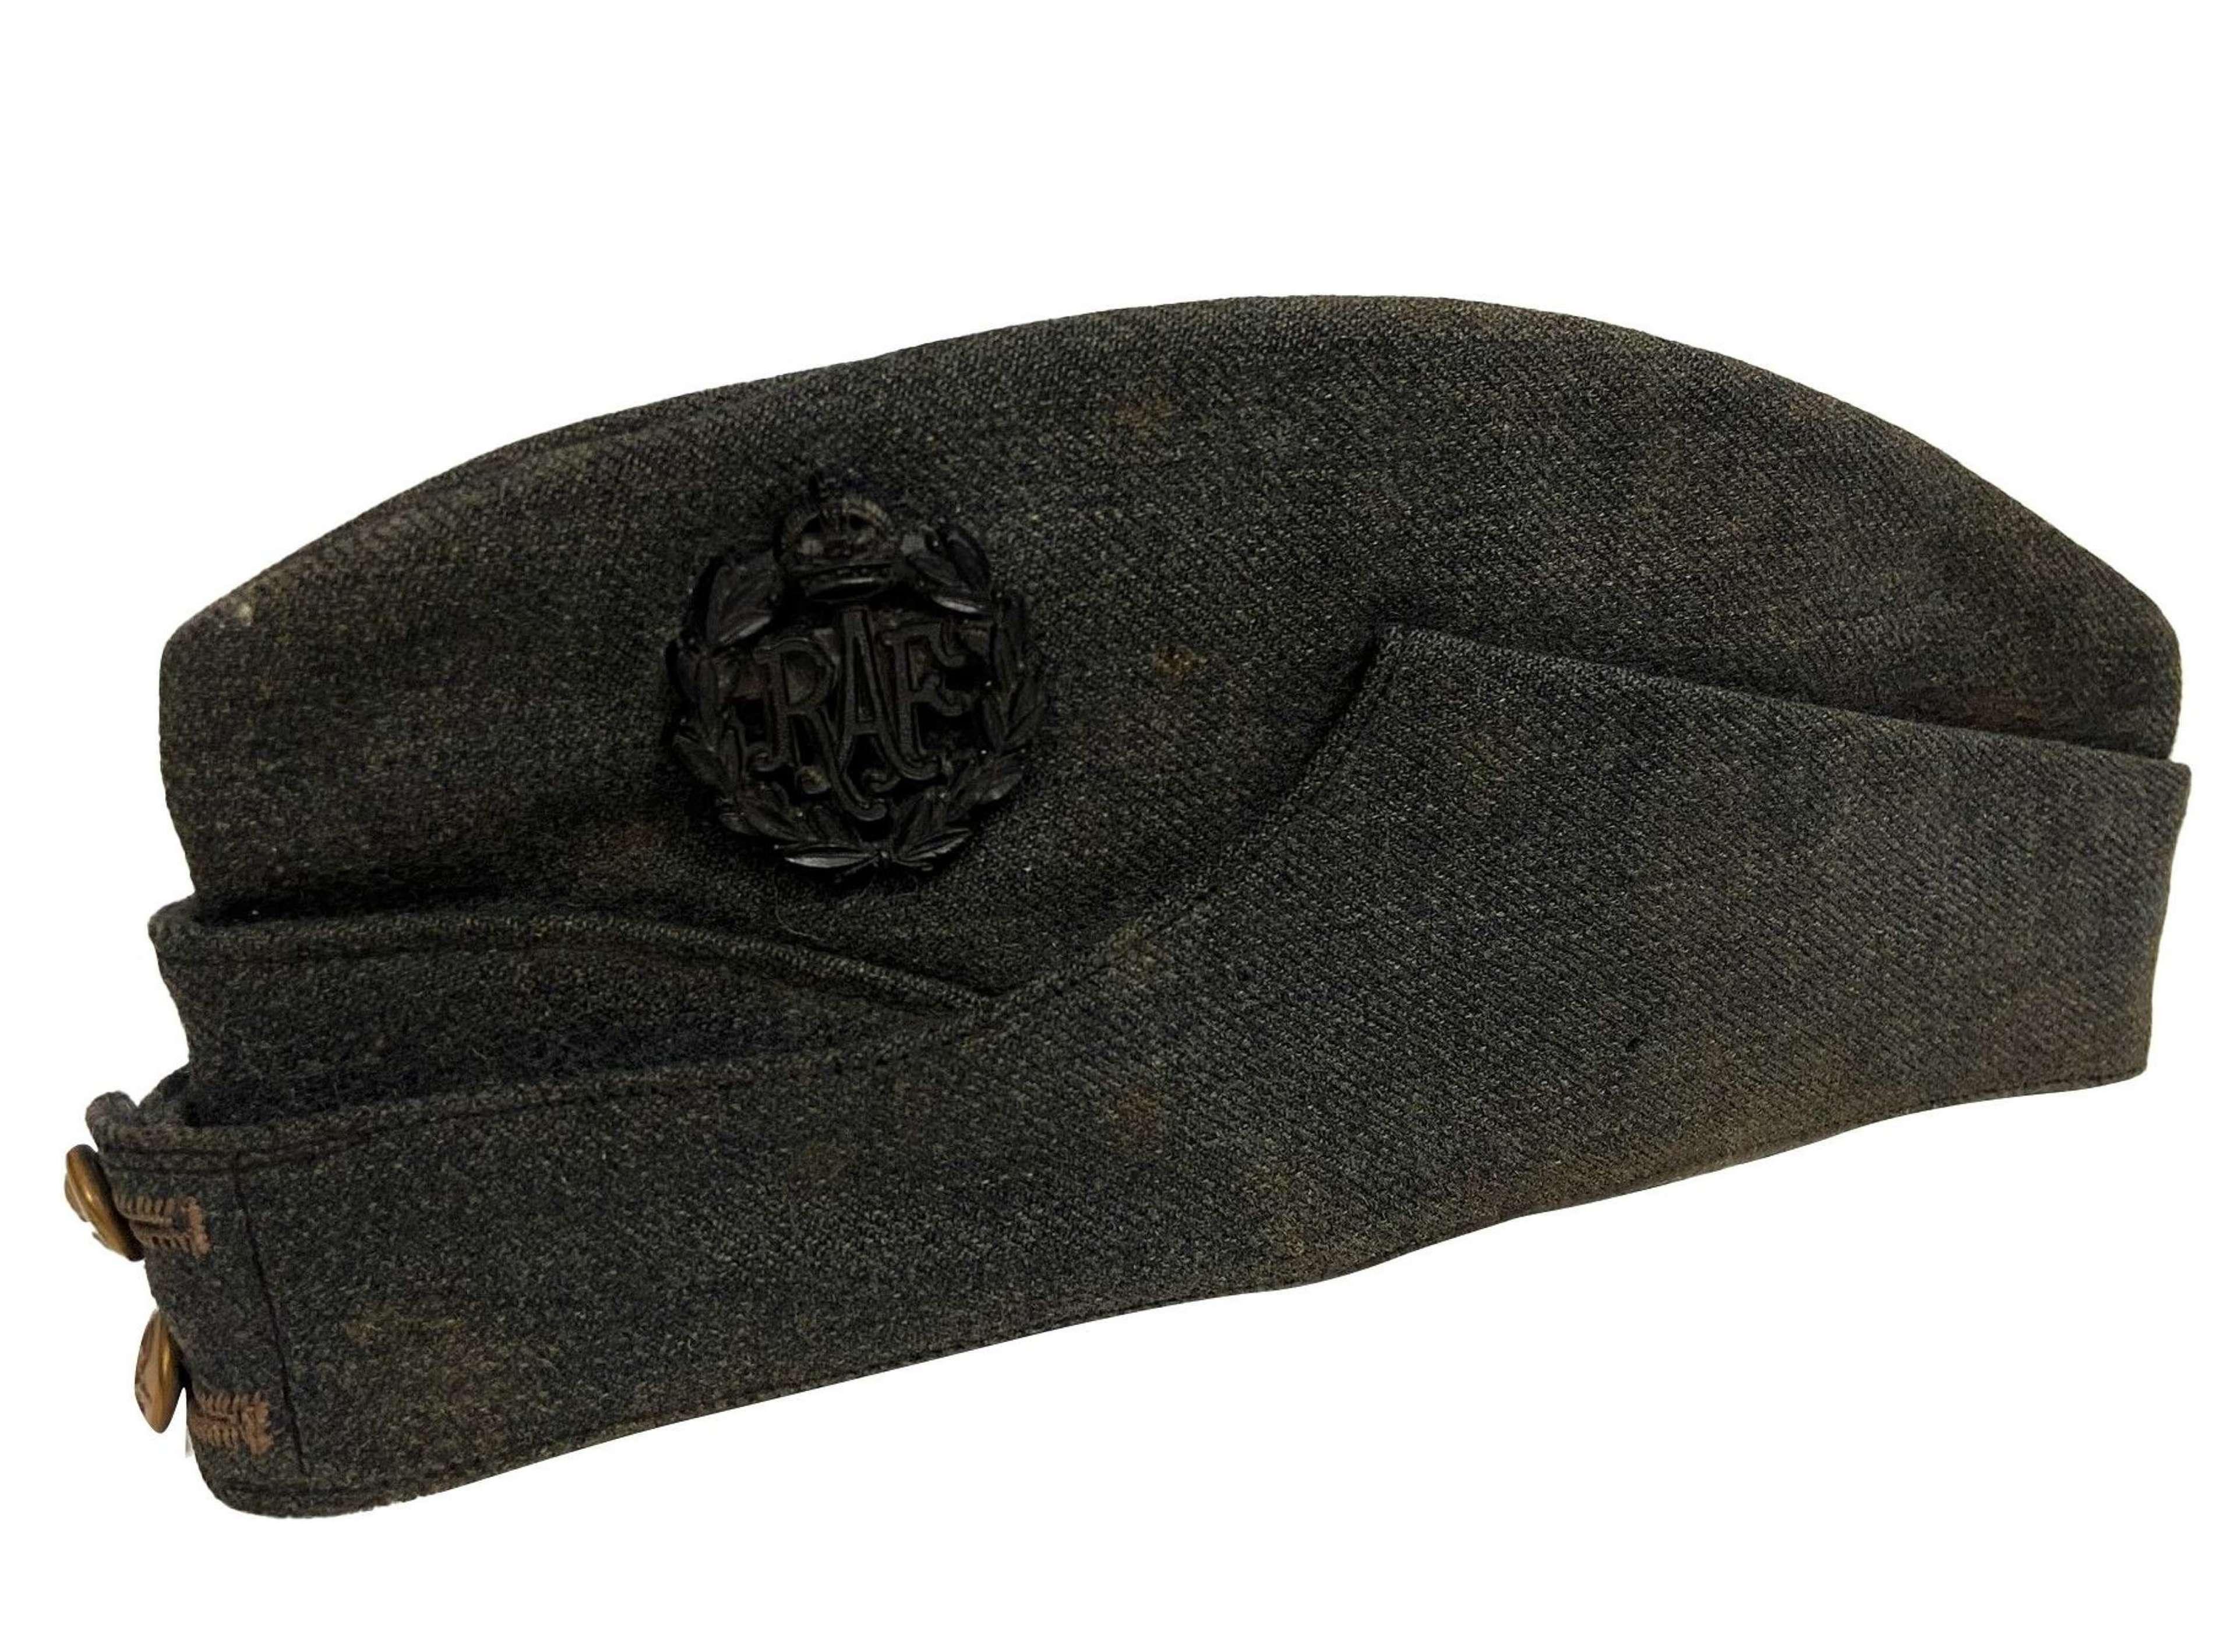 Original WW2 RAF Ordinary Airman's Forage Cap - Miles